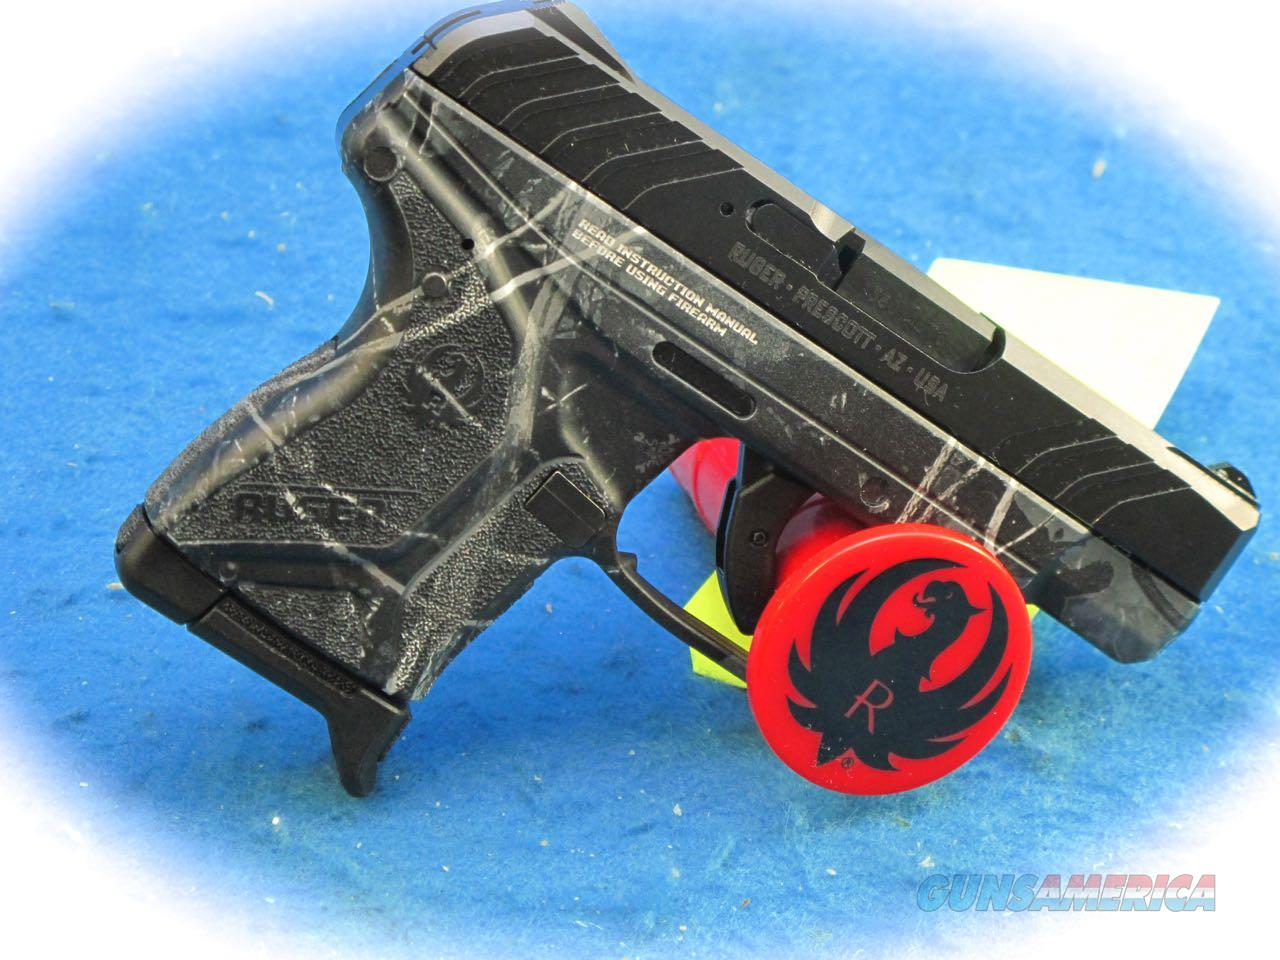 Ruger LCP II .380 ACP Pistol  Moonshine Harvest Moon Camo Model 3767 **New**   Guns > Pistols > Ruger Semi-Auto Pistols > LCP